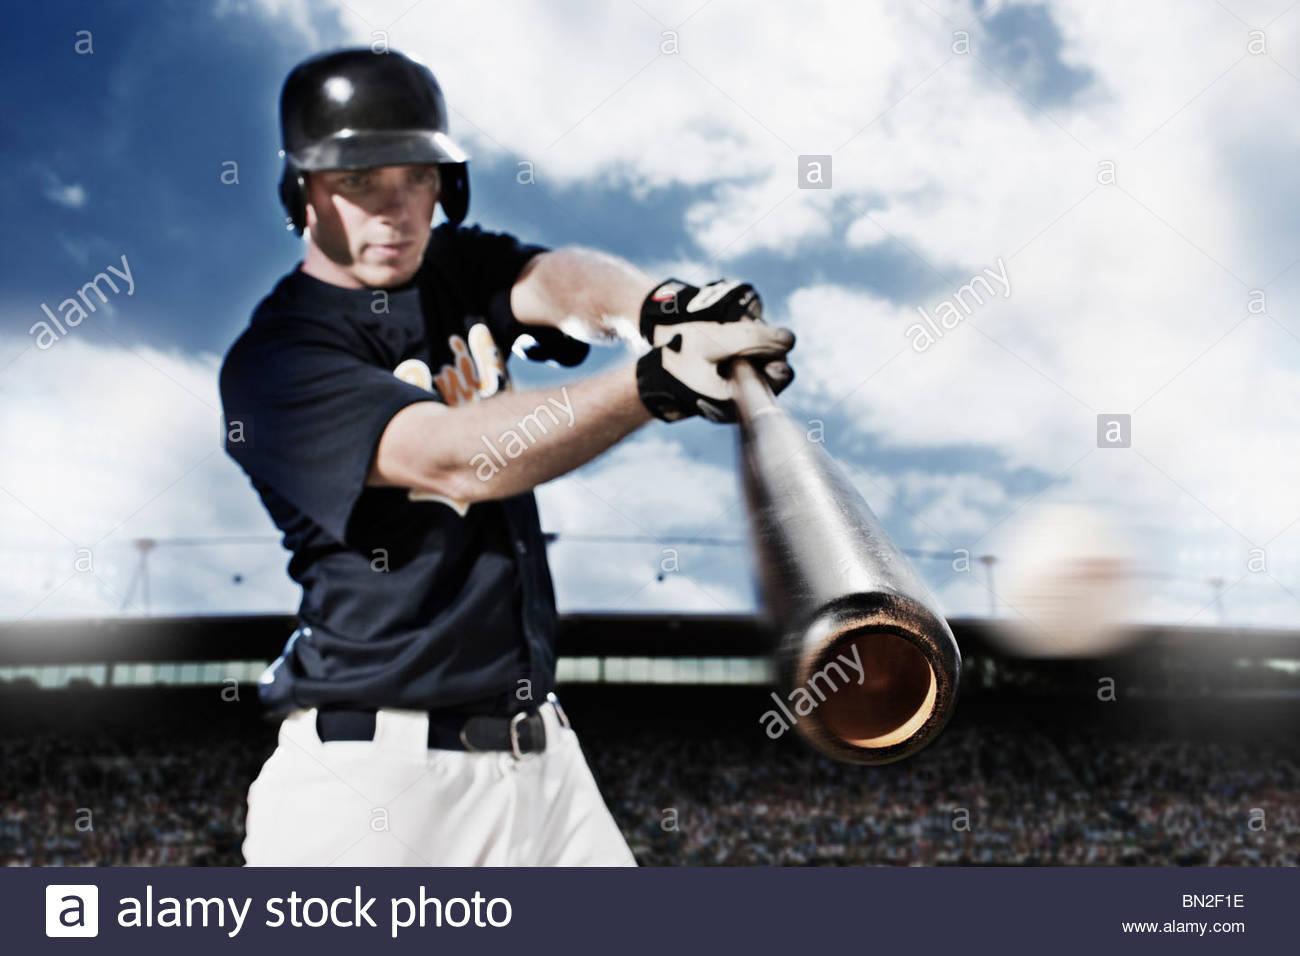 Baseball player swinging baseball bat - Stock Image